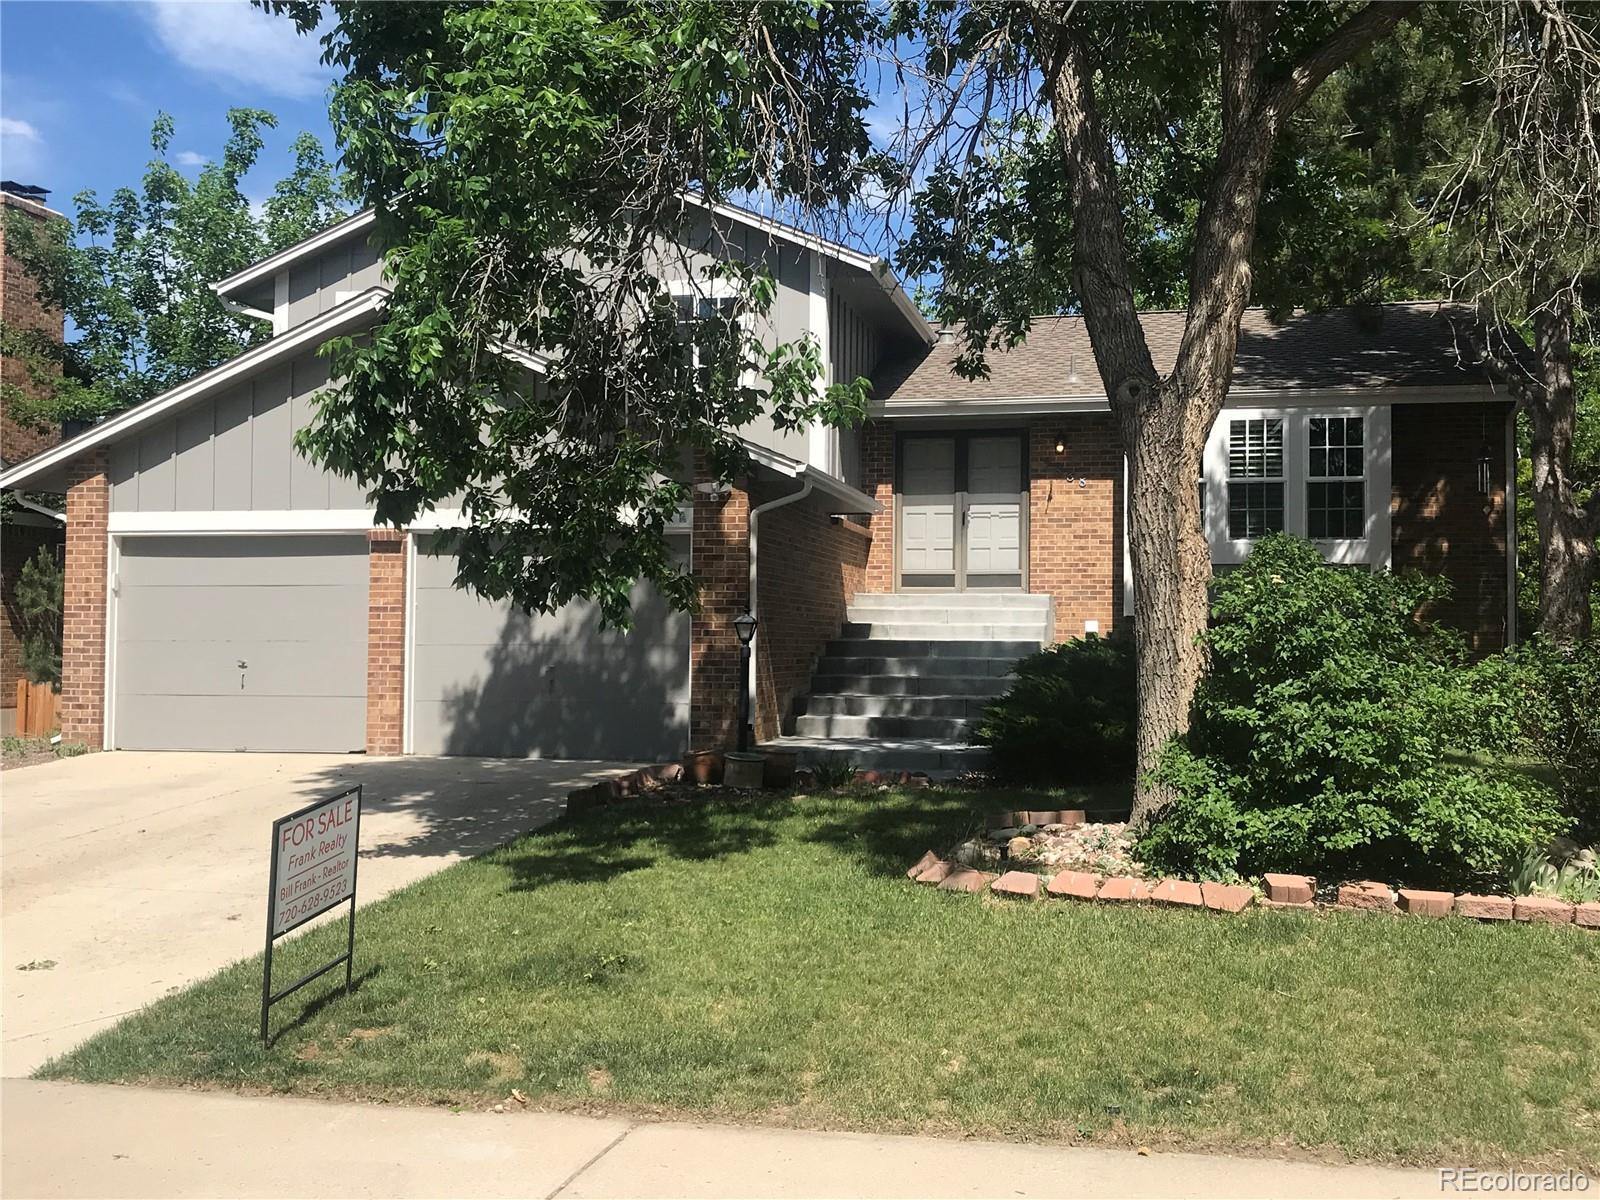 7888 S Magnolia Way Property Photo - Centennial, CO real estate listing